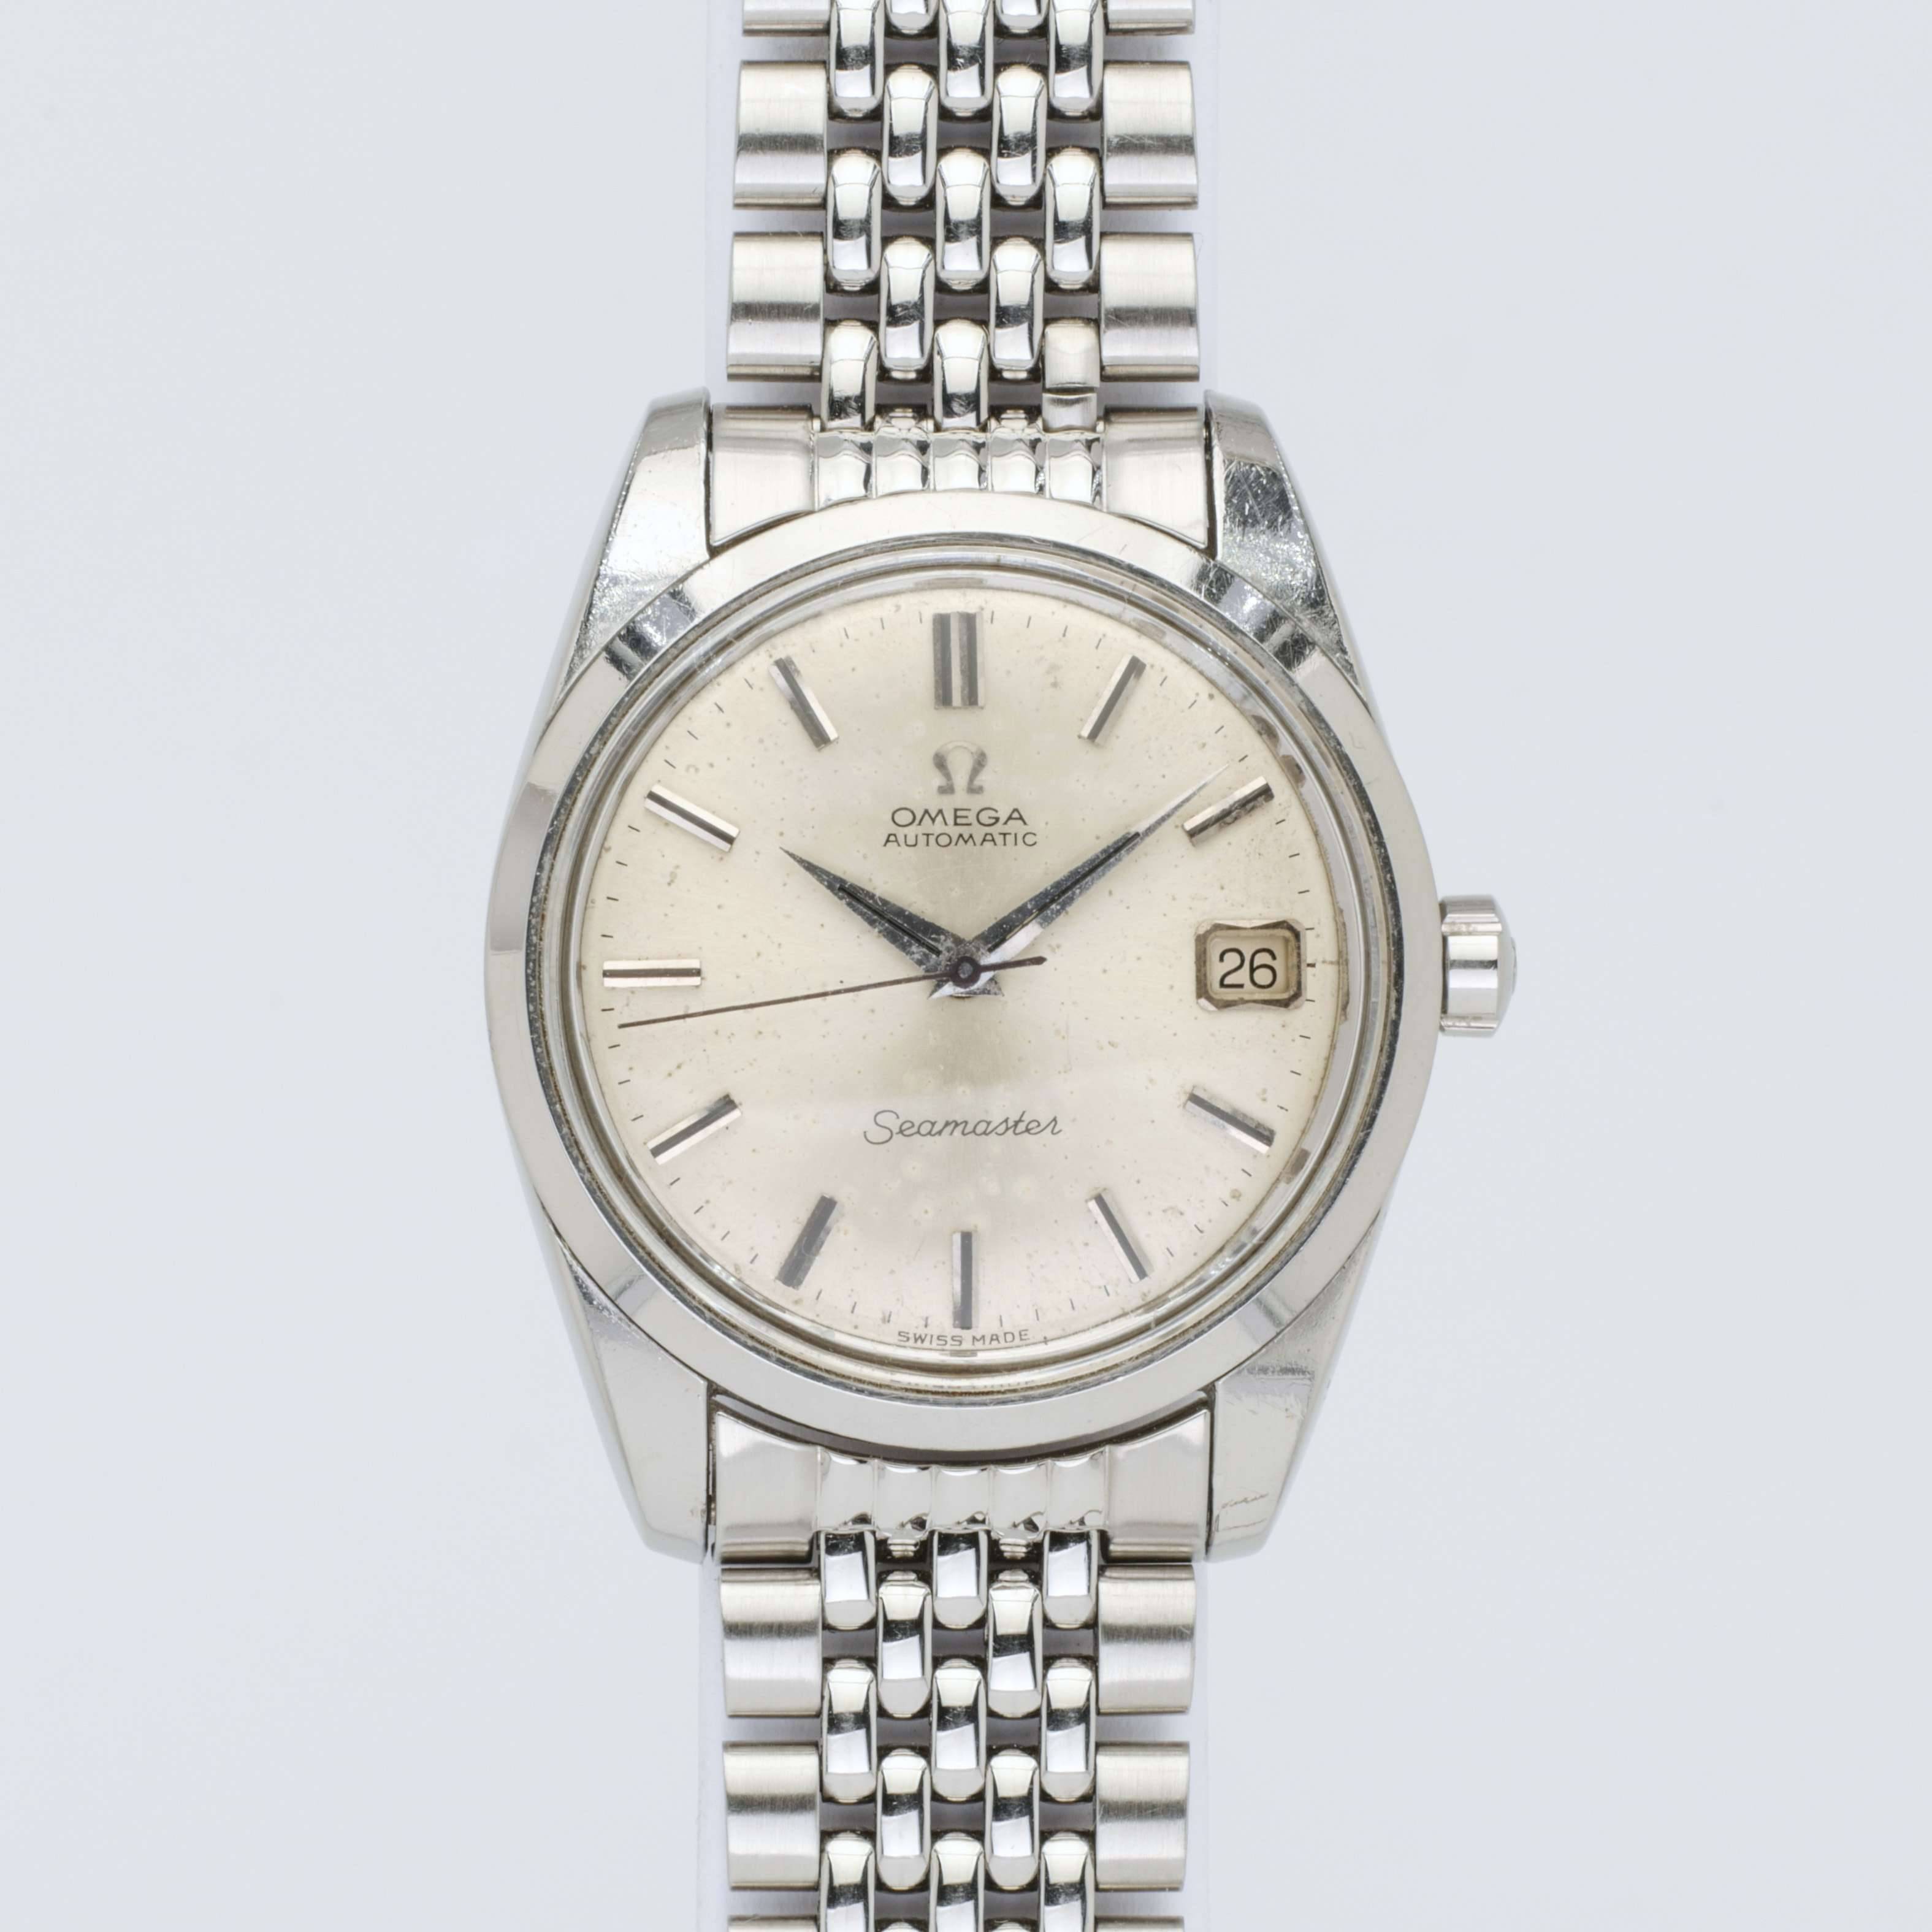 Omega Seamaster 166.010 24833932